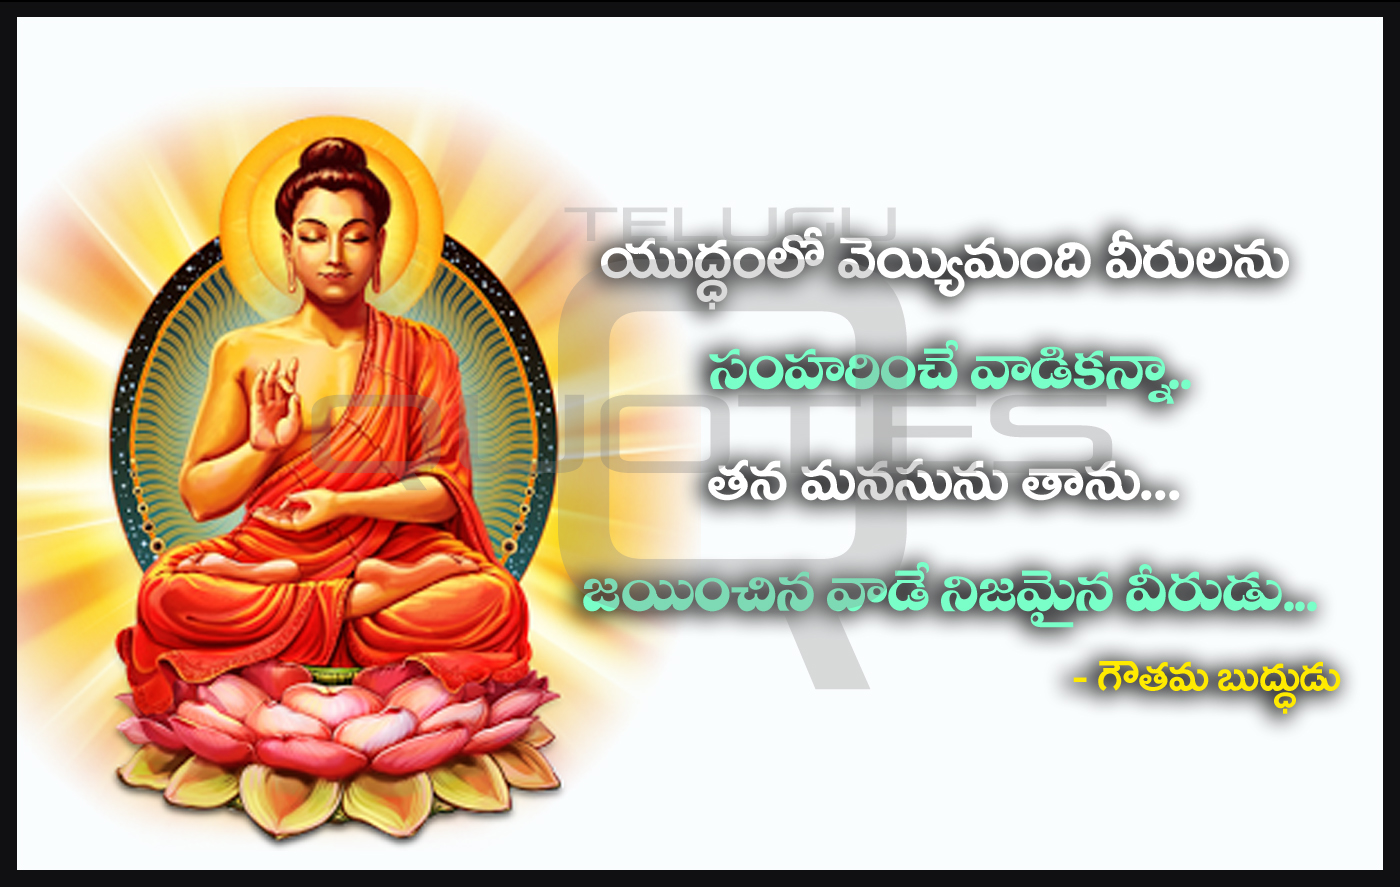 Gautama Buddha Quotes Gauthama Buddha Quotes In Telugu Wallpapers Best Life Inspiration